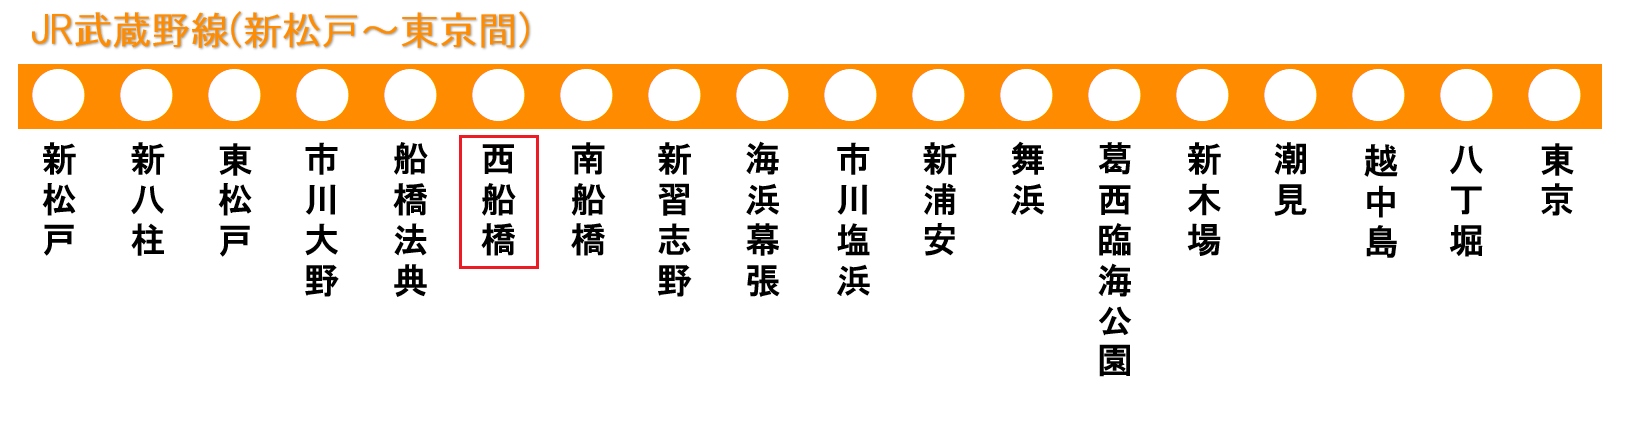 武蔵野線の路線図(西船橋駅)